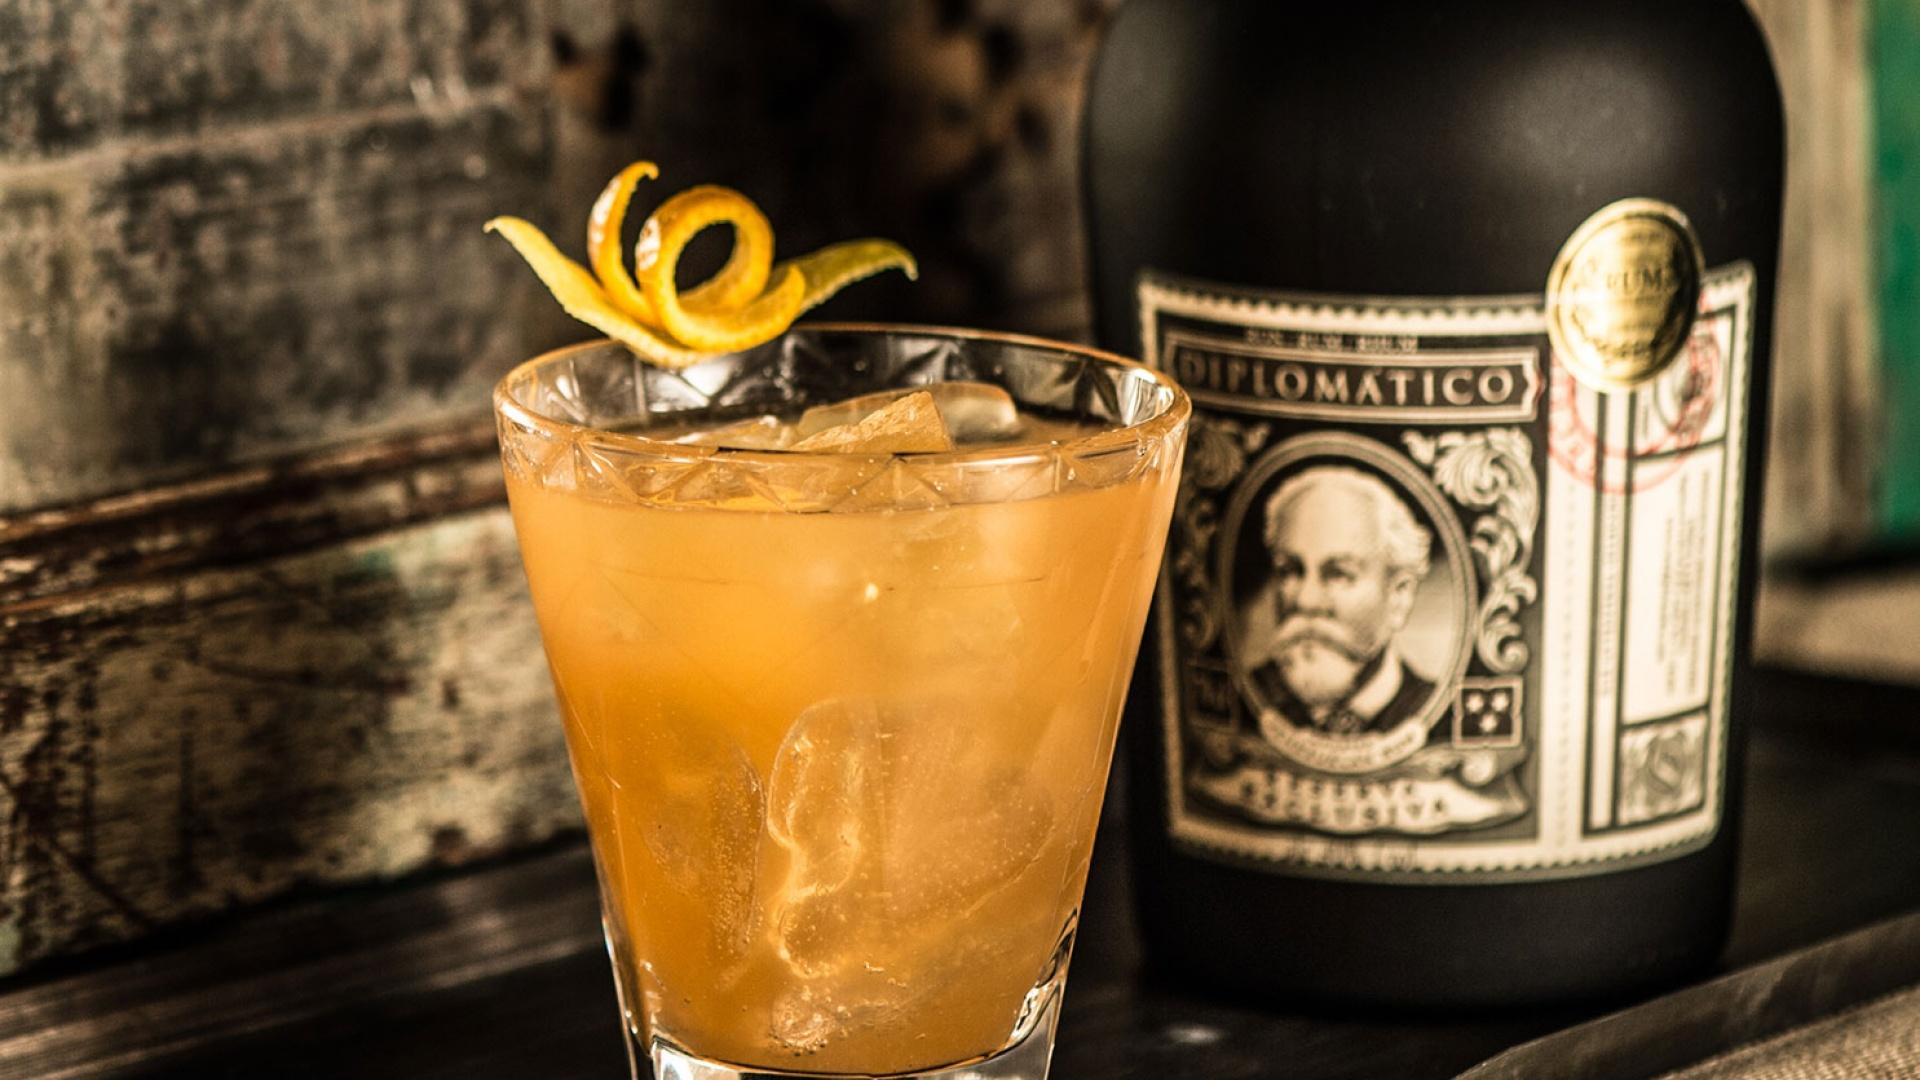 Diplomatico's Ensemble cocktail